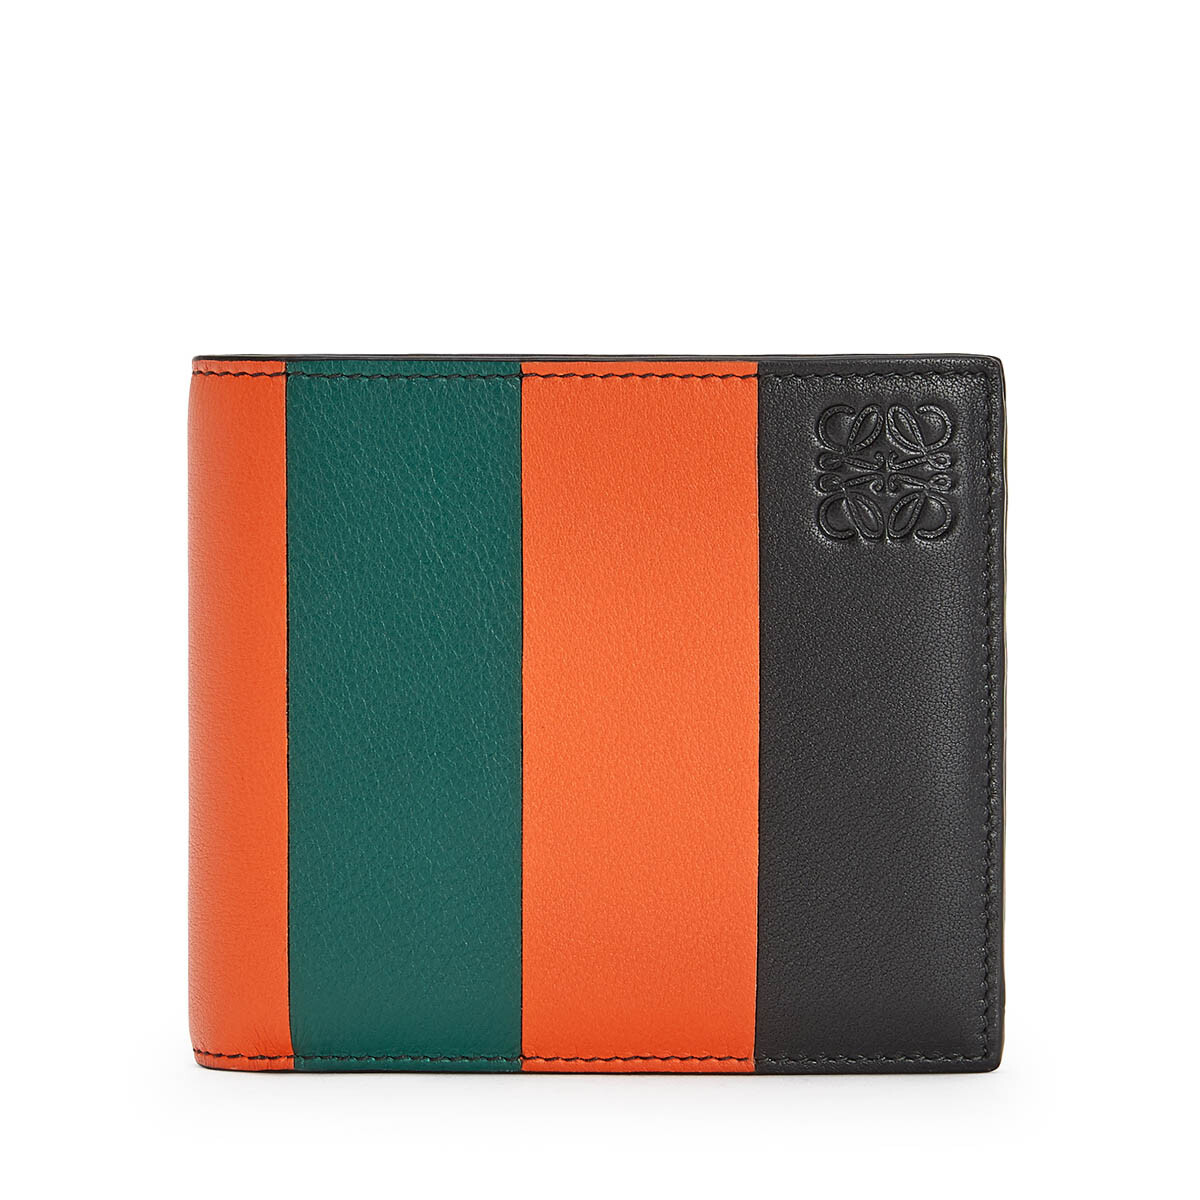 LOEWE Stripes Bifold Wallet オレンジ/グリーン front